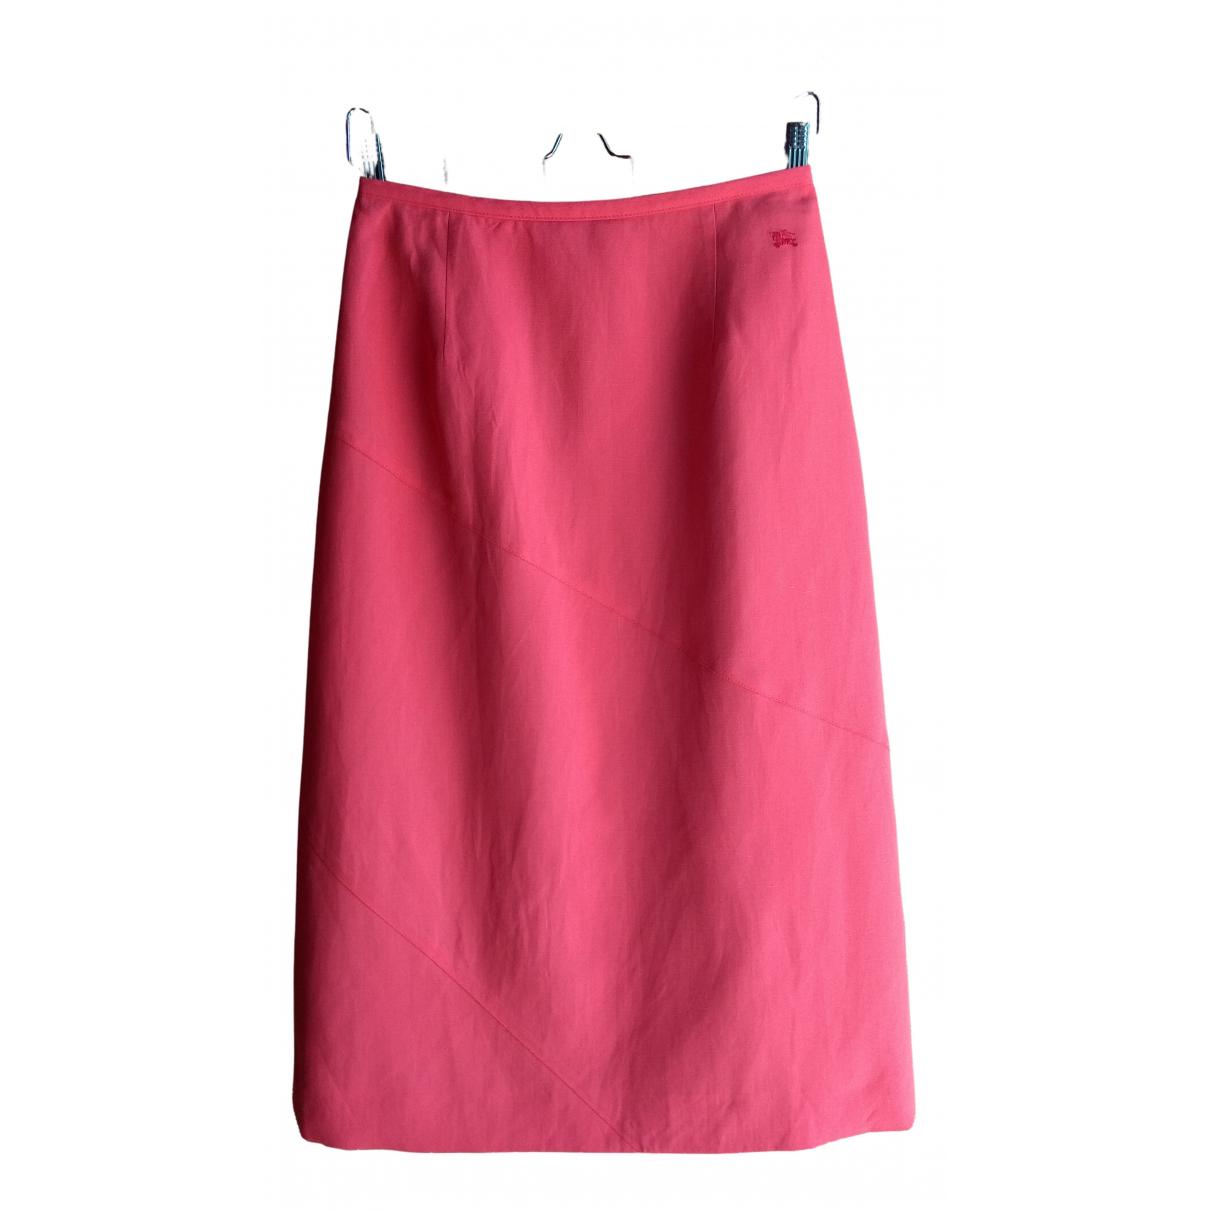 Burberry \N Pink Linen skirt for Women 42 IT